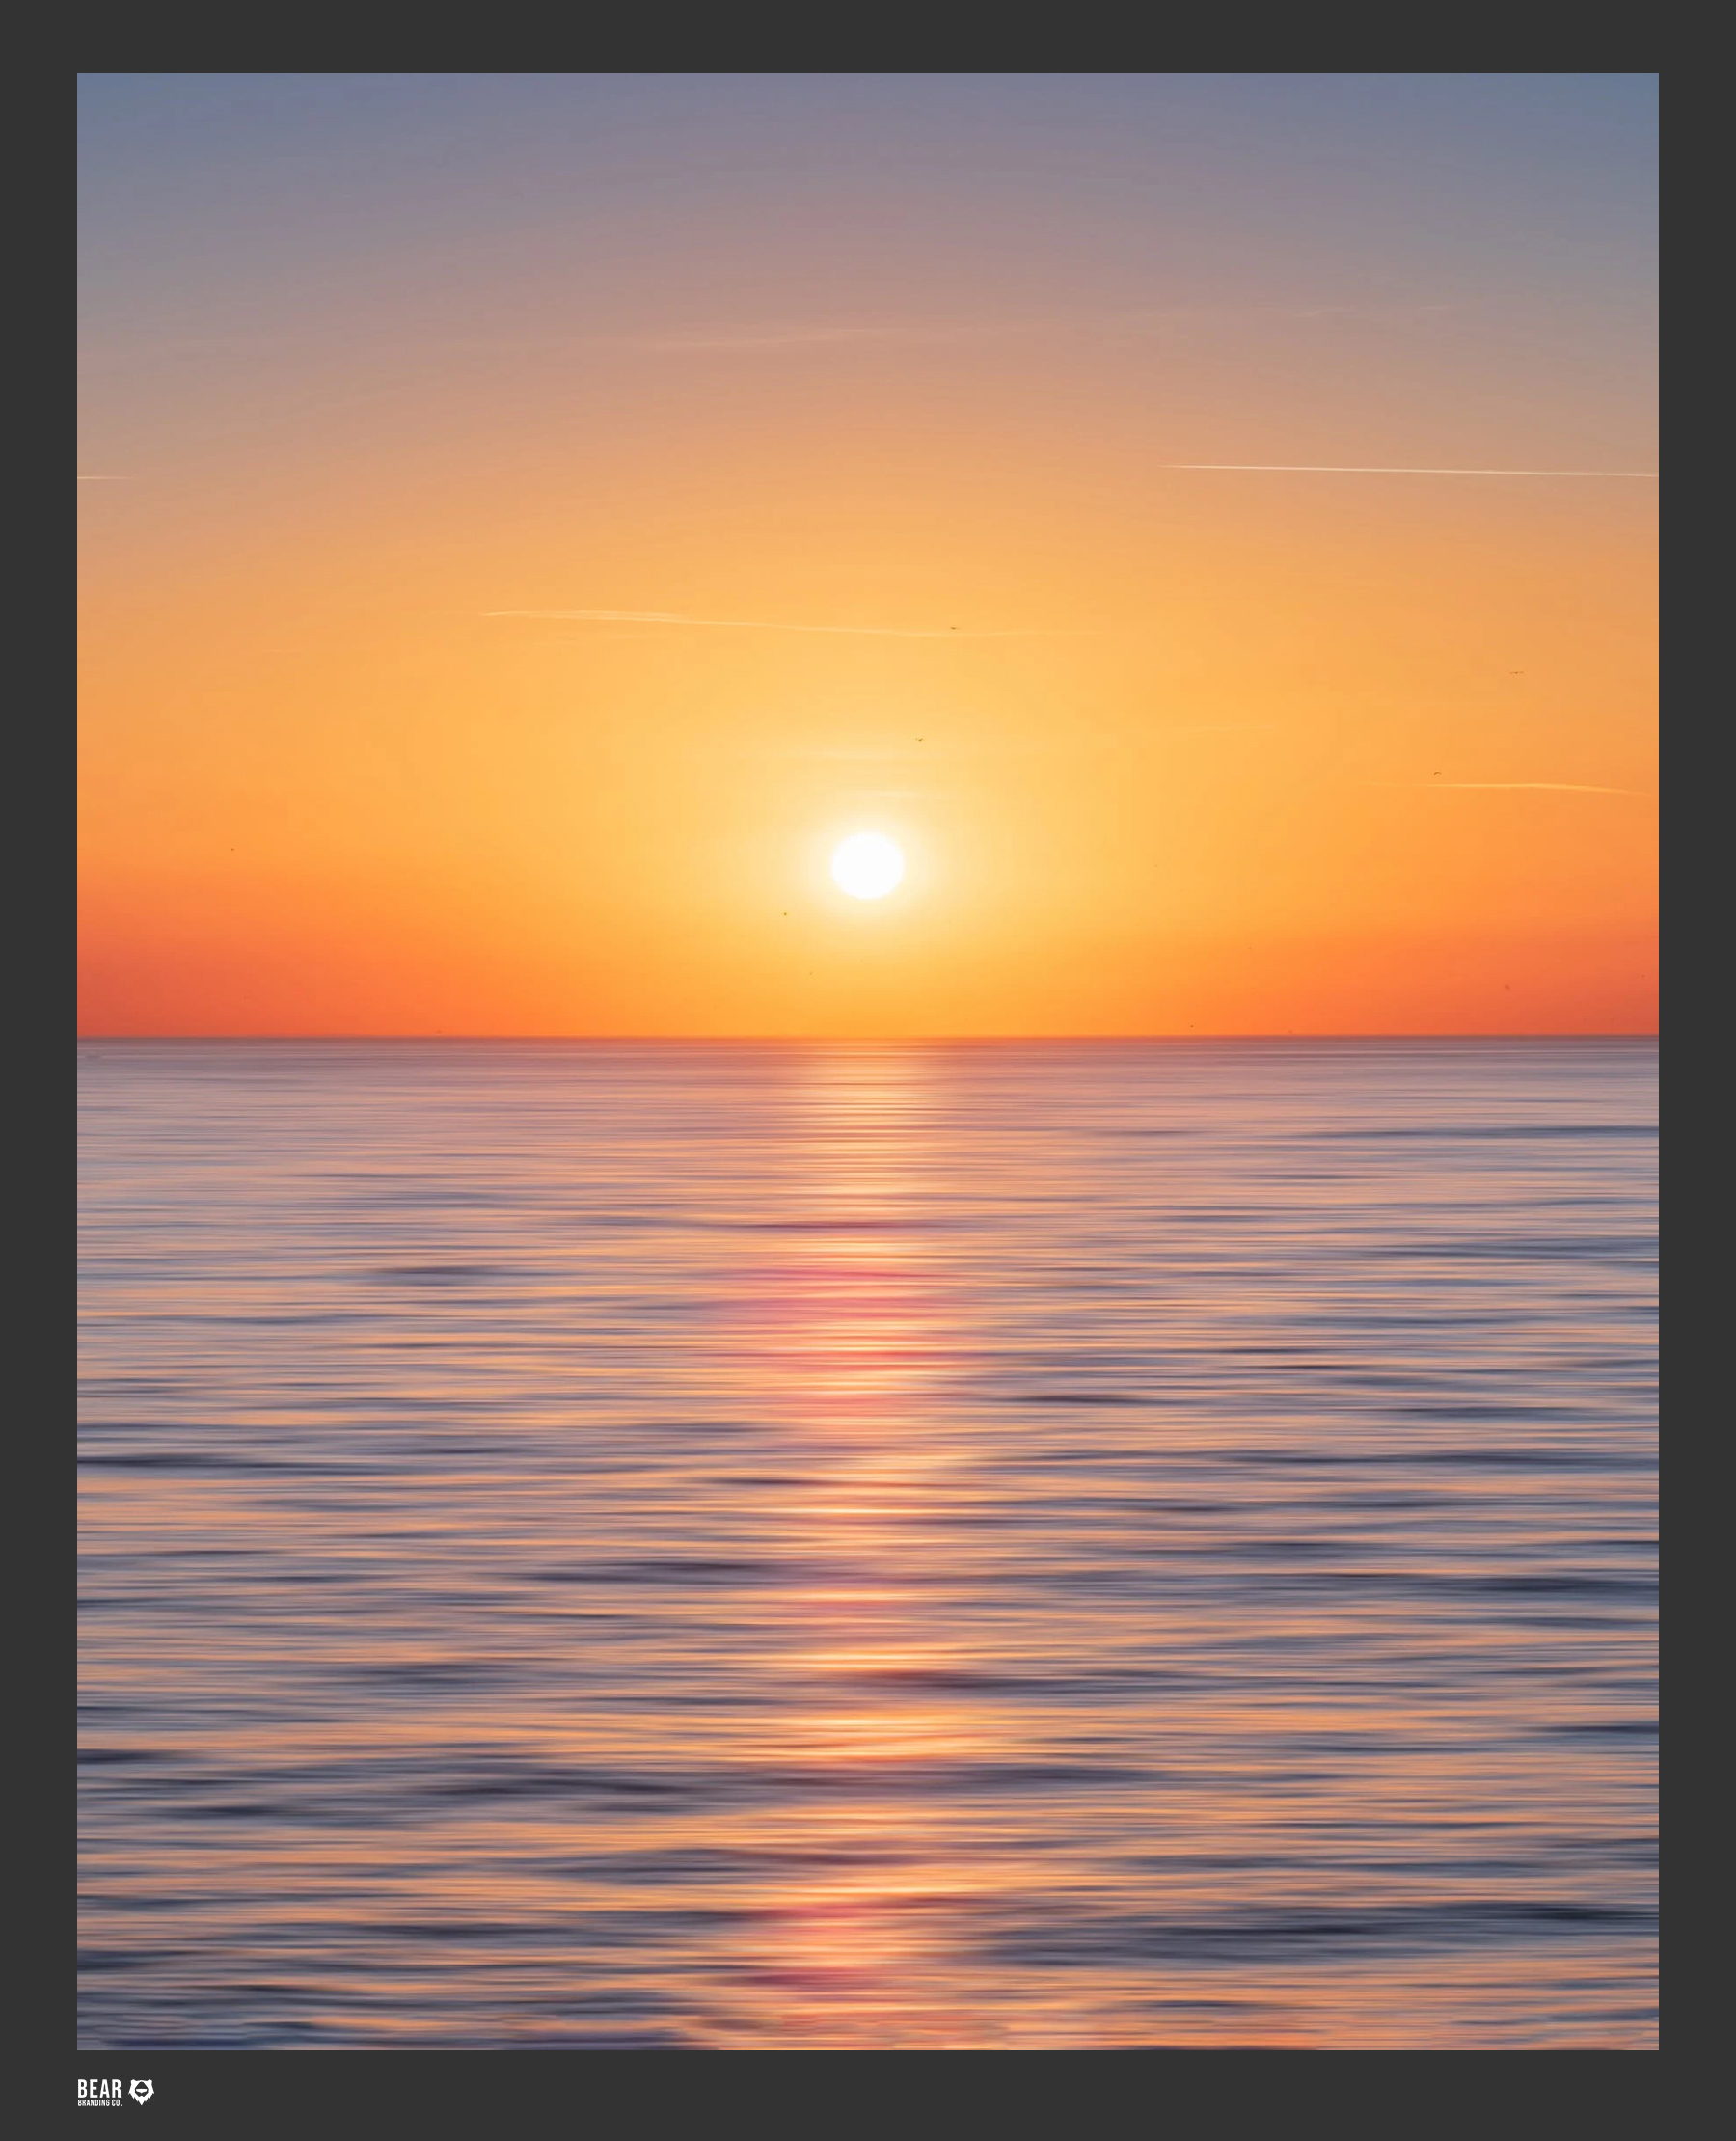 New-Dawn-Image